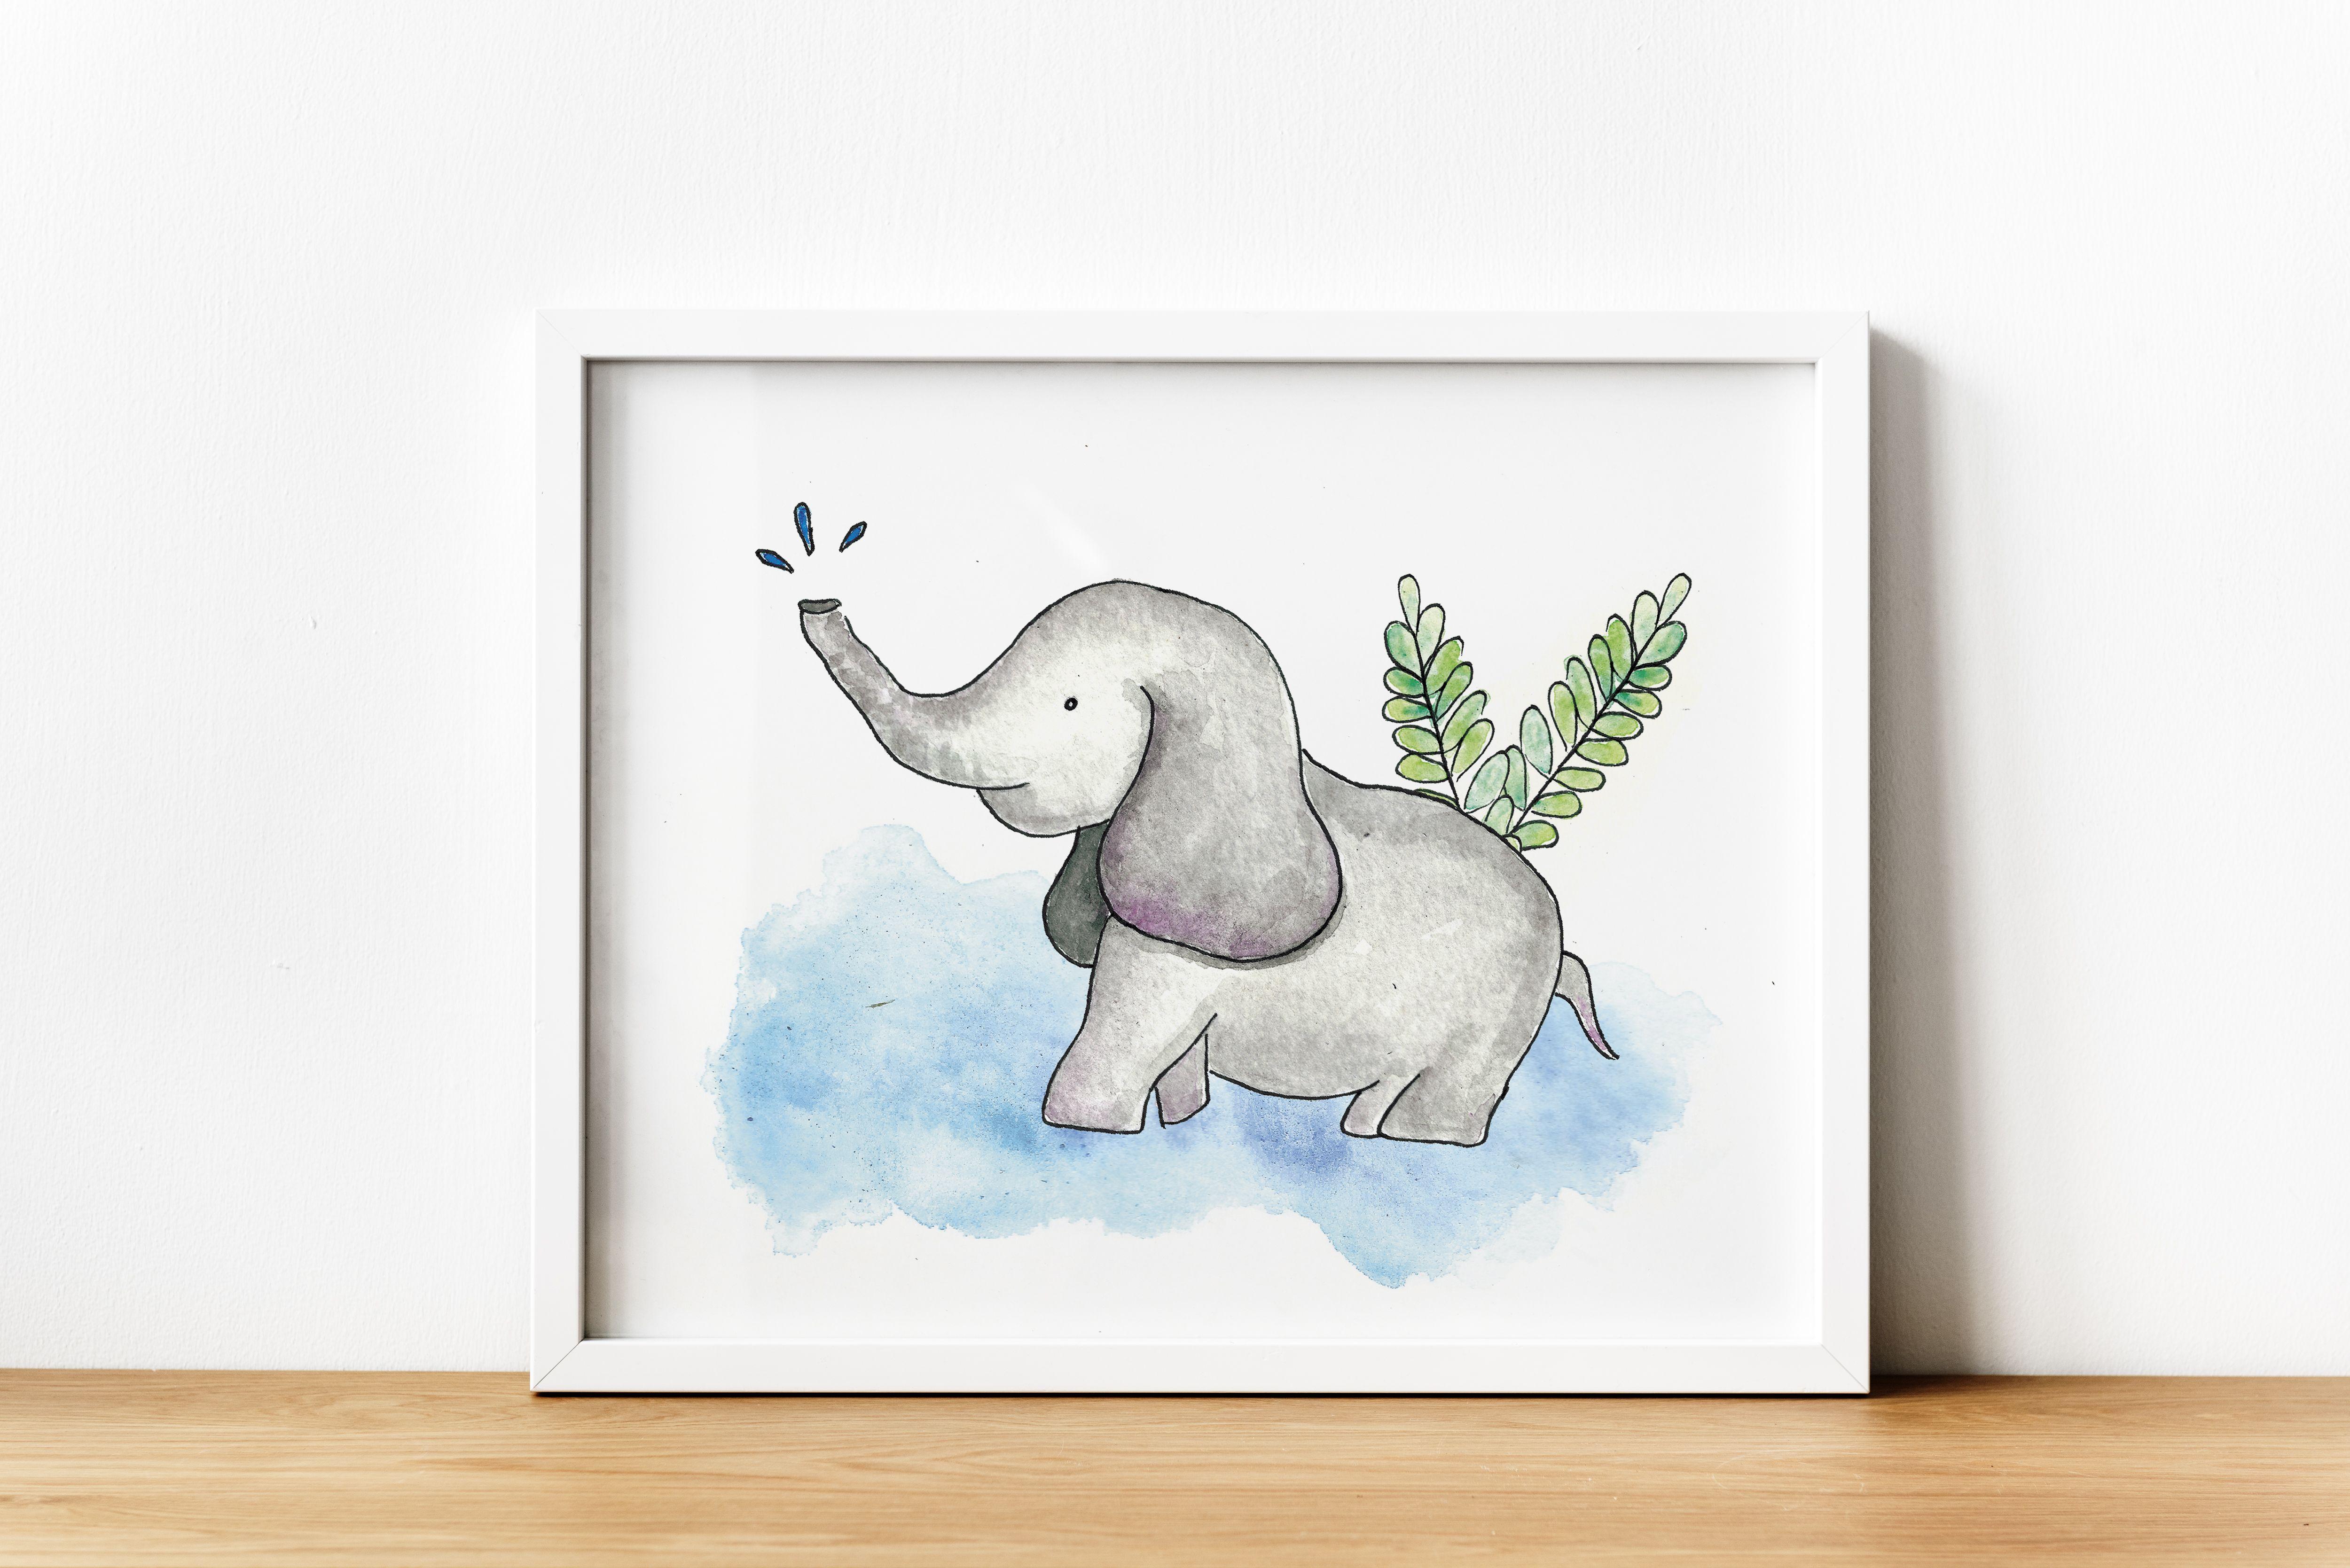 Elephant Printable Watercolor Nursery Printable Art Kids Baby Elephant Art Download Digital Elephant Printable Elephant Baby Elephants Art Kids Printable Art Elephant Art